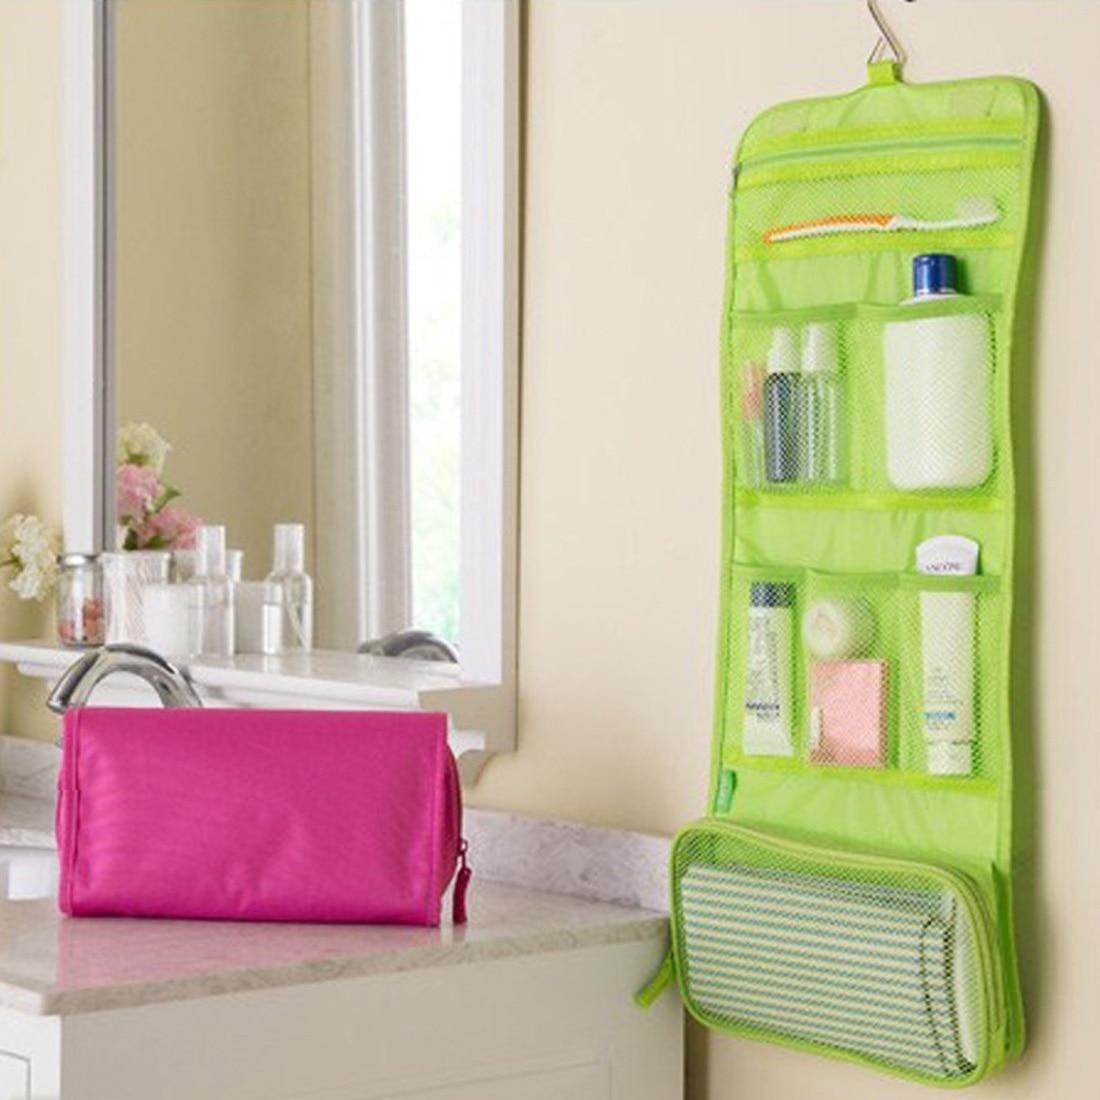 New Portable Hanging Organizer Bag Foldable Cosmetic Makeup